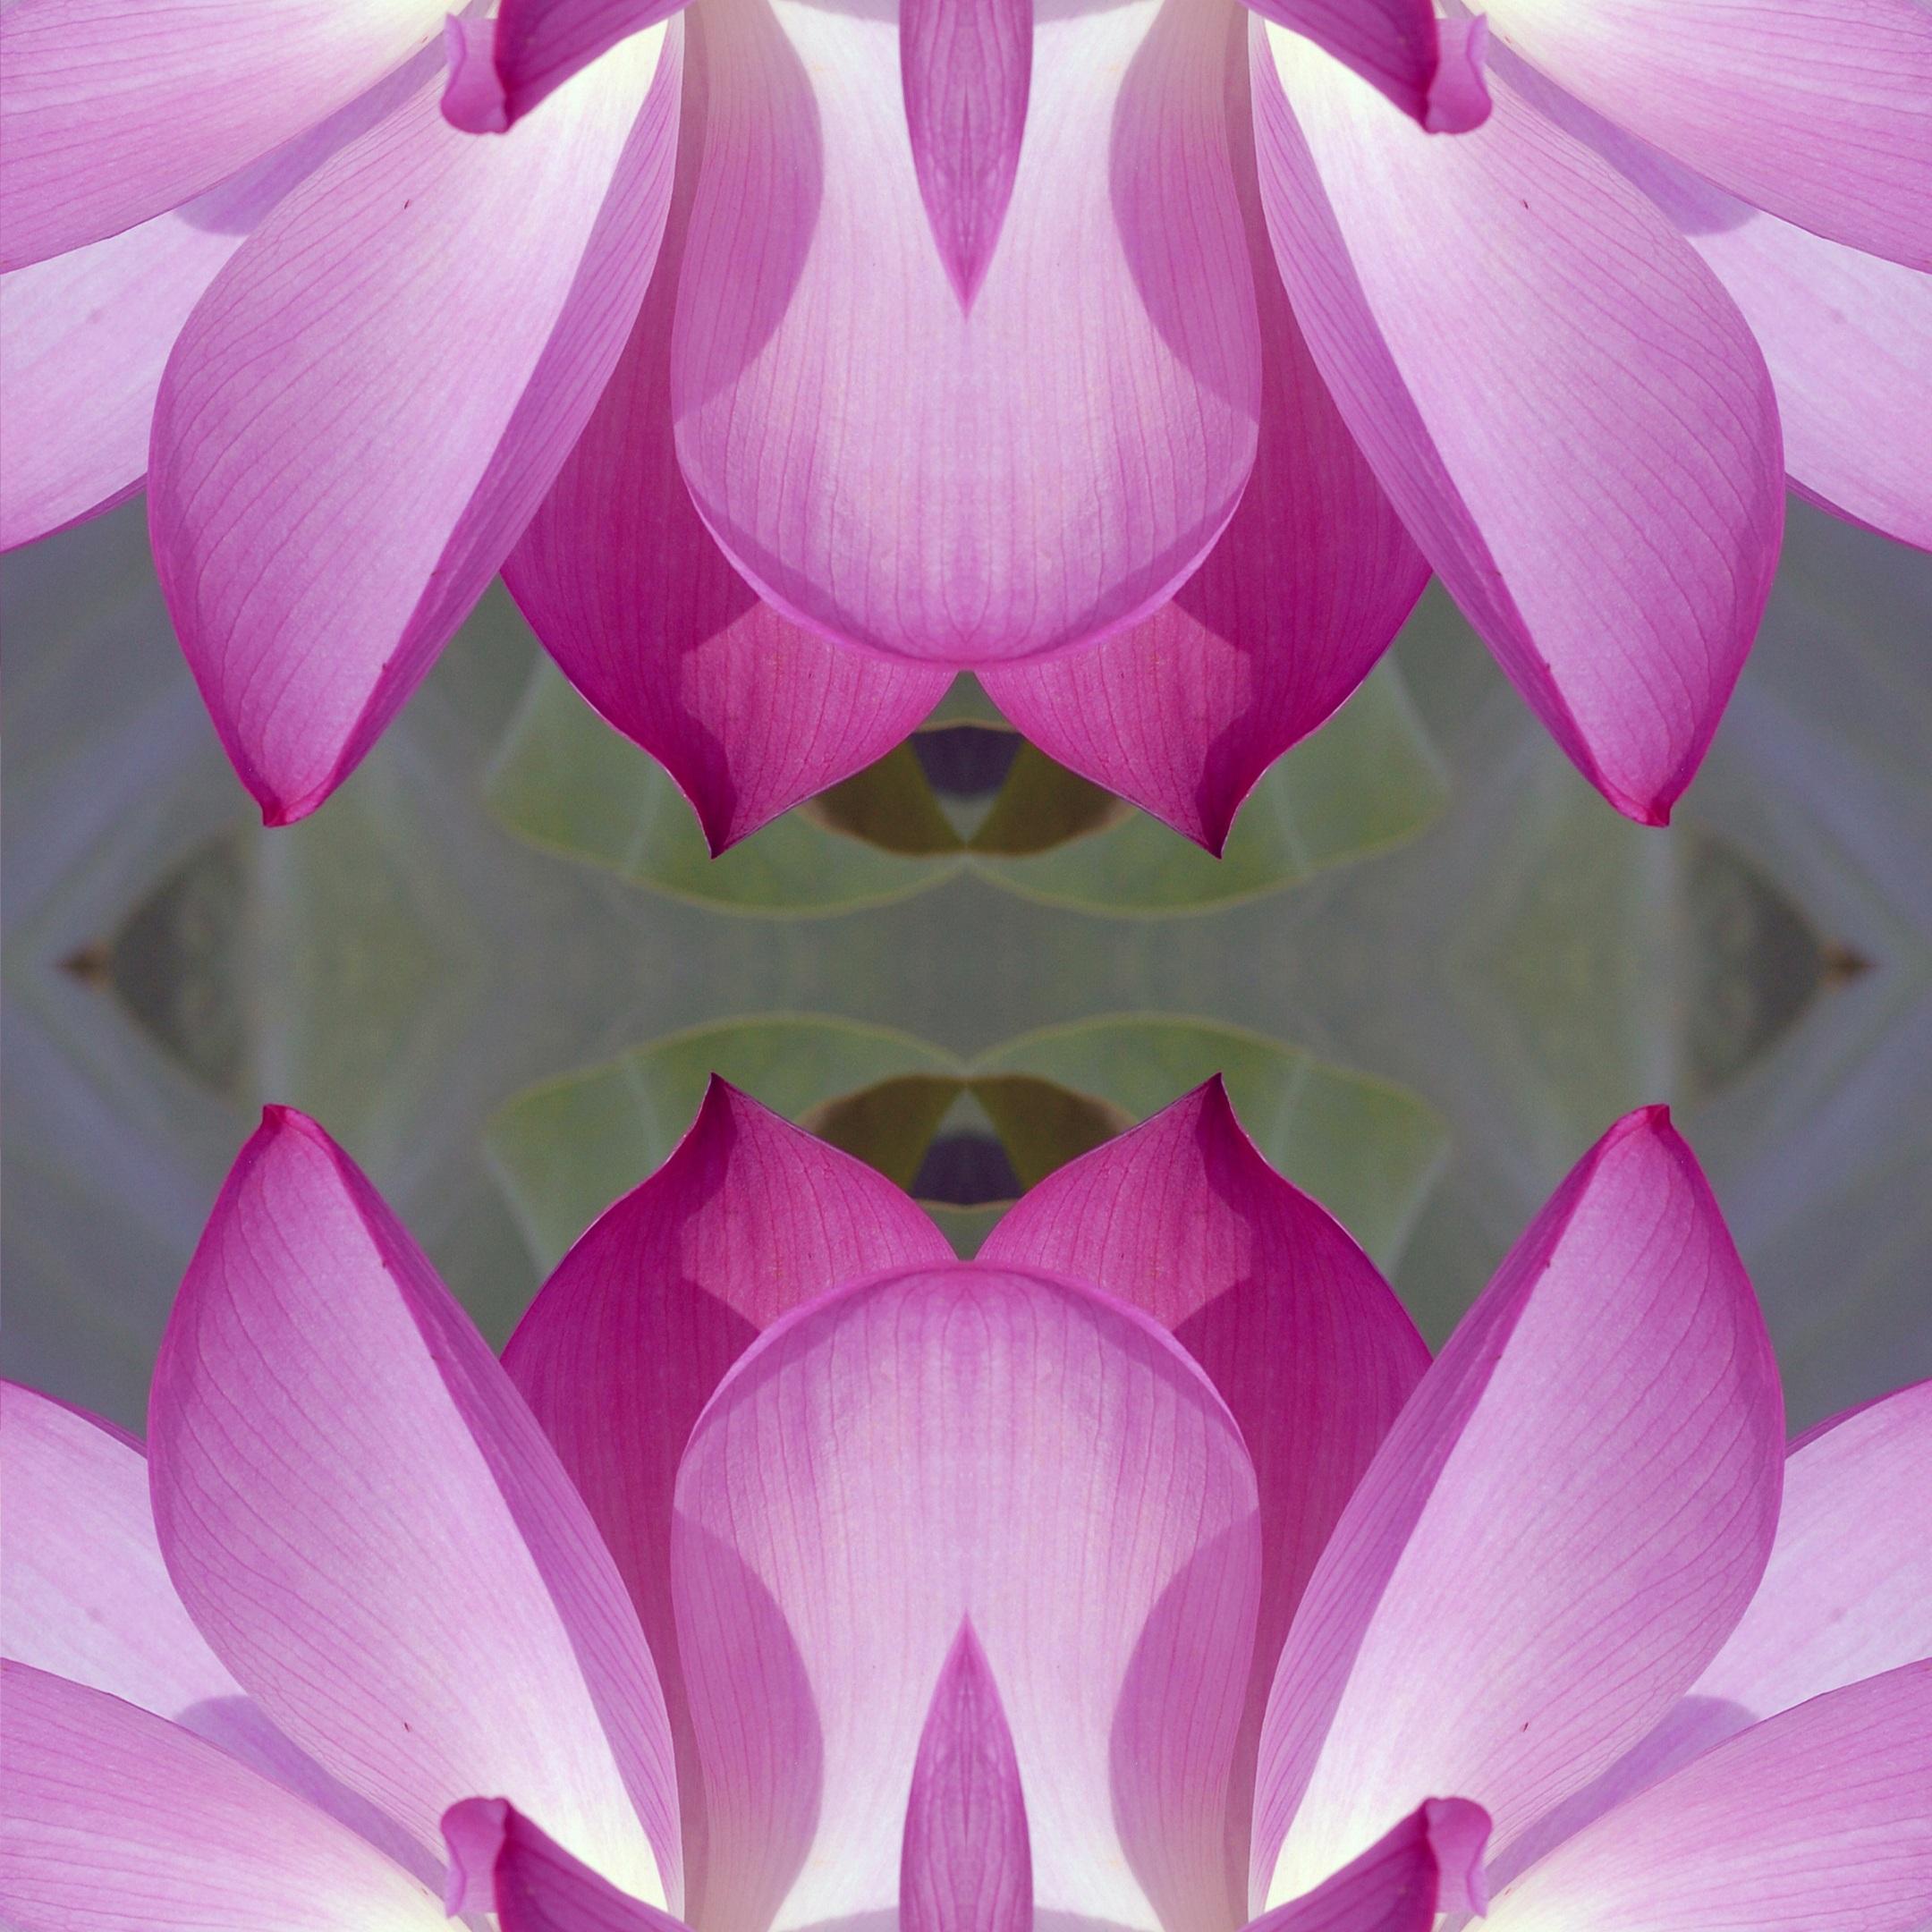 Gambar Alam Outdoor Mekar Abstrak Menanam Ungu Daun Bunga